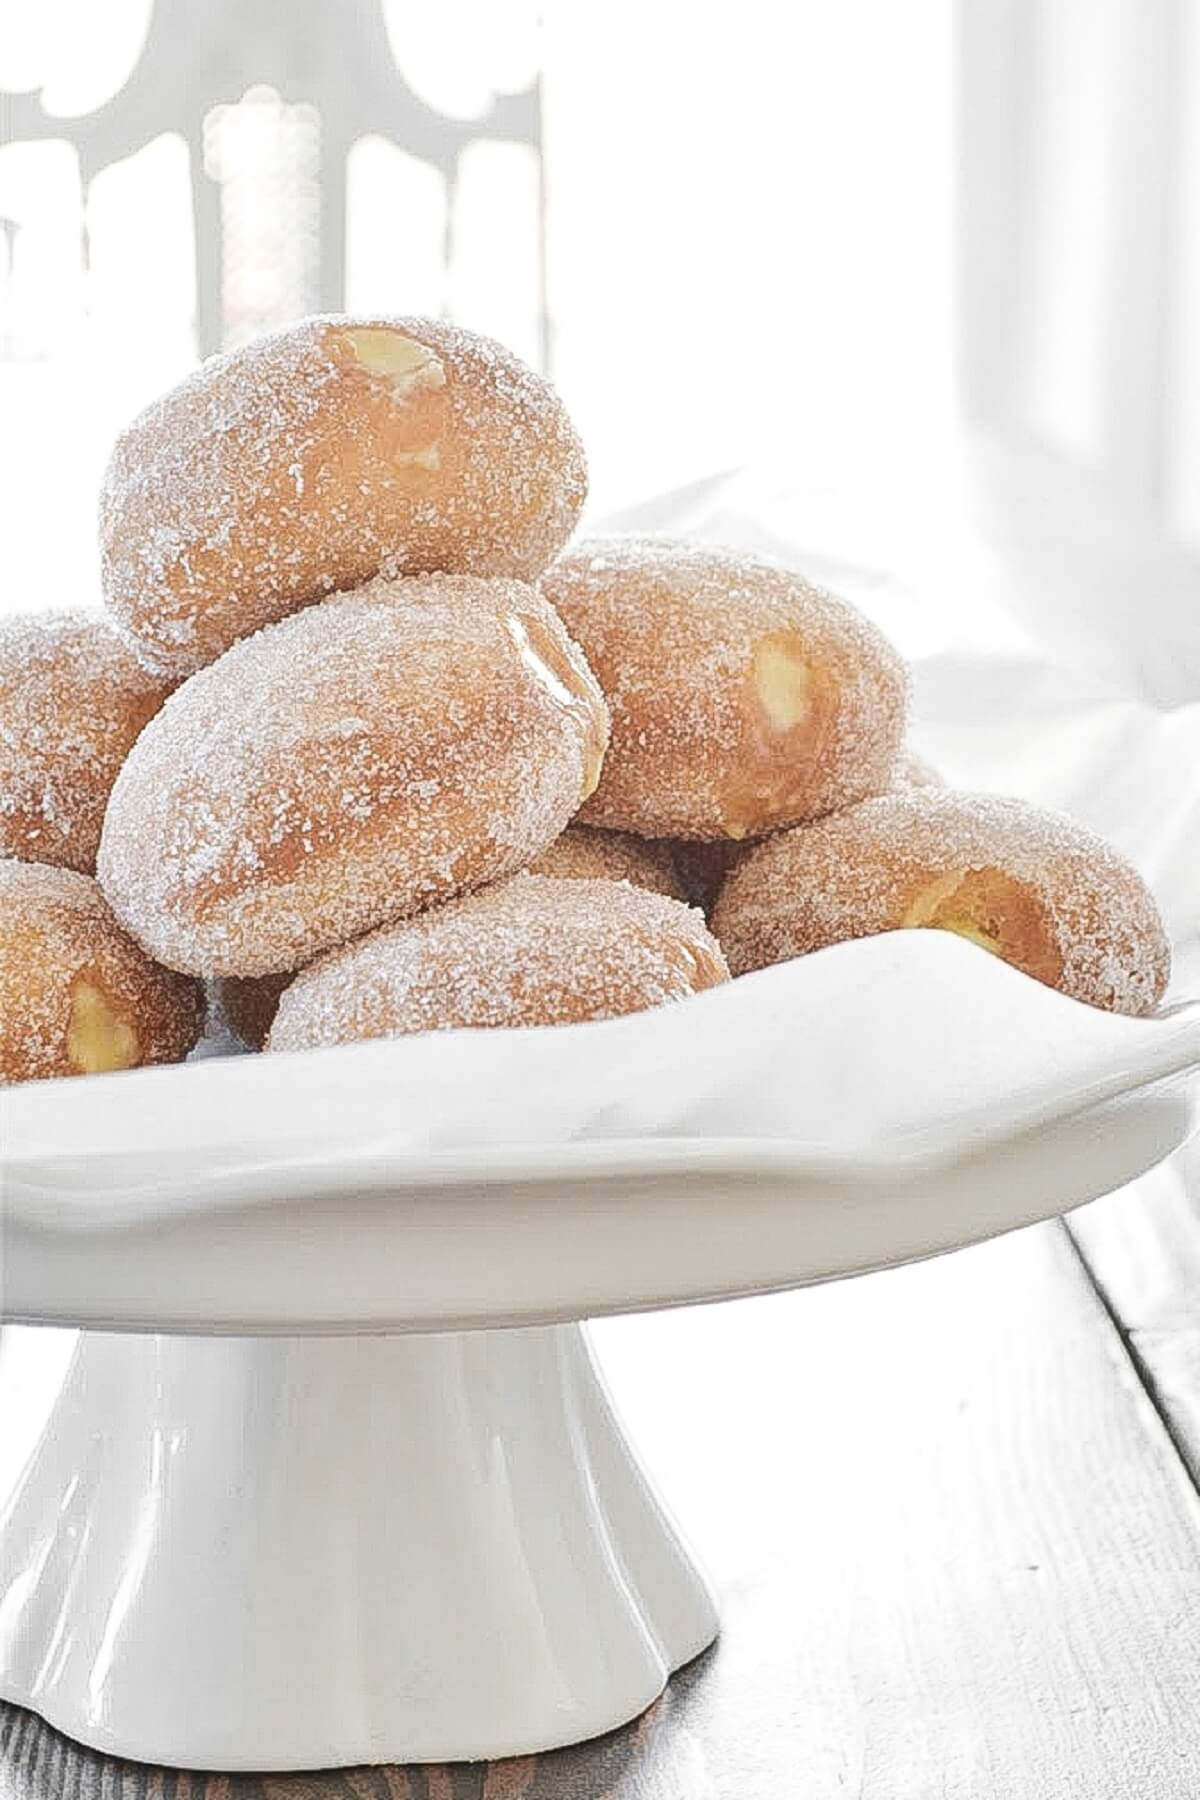 Doughnuts filled with champagne custard, coated in sugar.